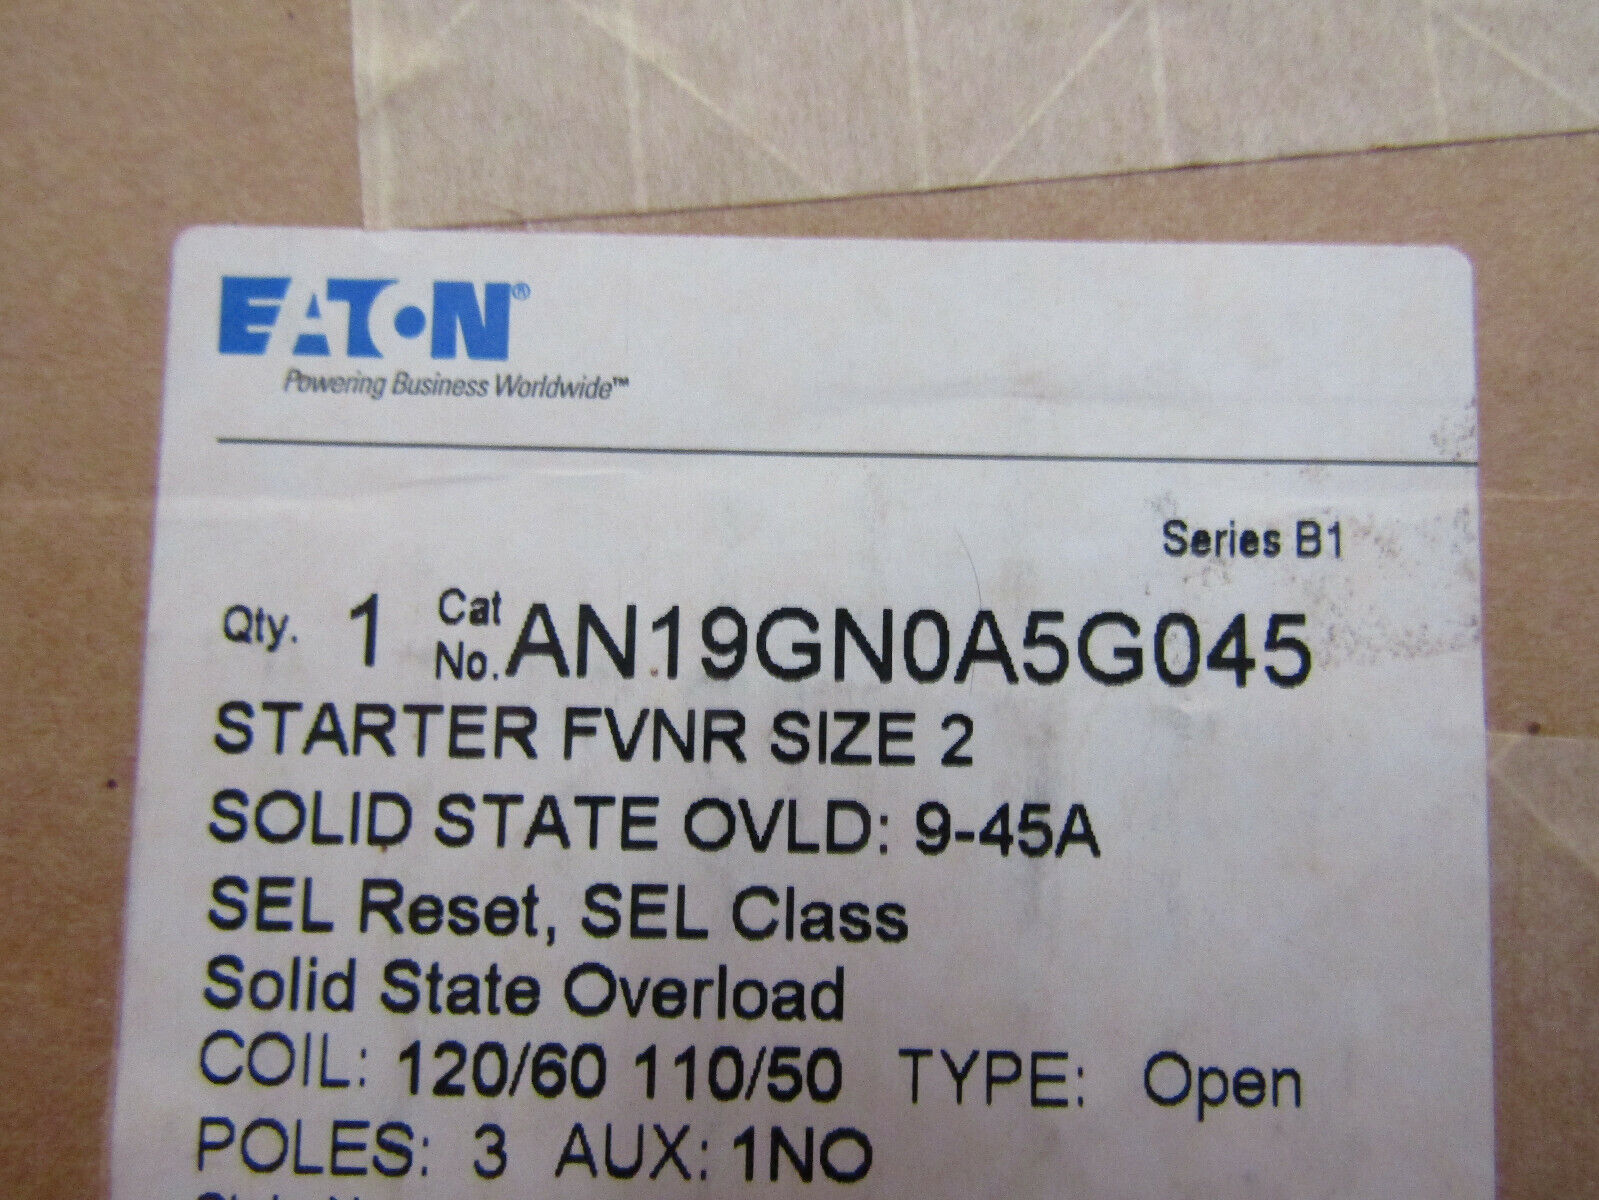 Eaton AN19GN0A5E045 SZ-2 FVNR Starter 240VAC Starter 3-Pole Coil 120/60 110/50 - $425.00